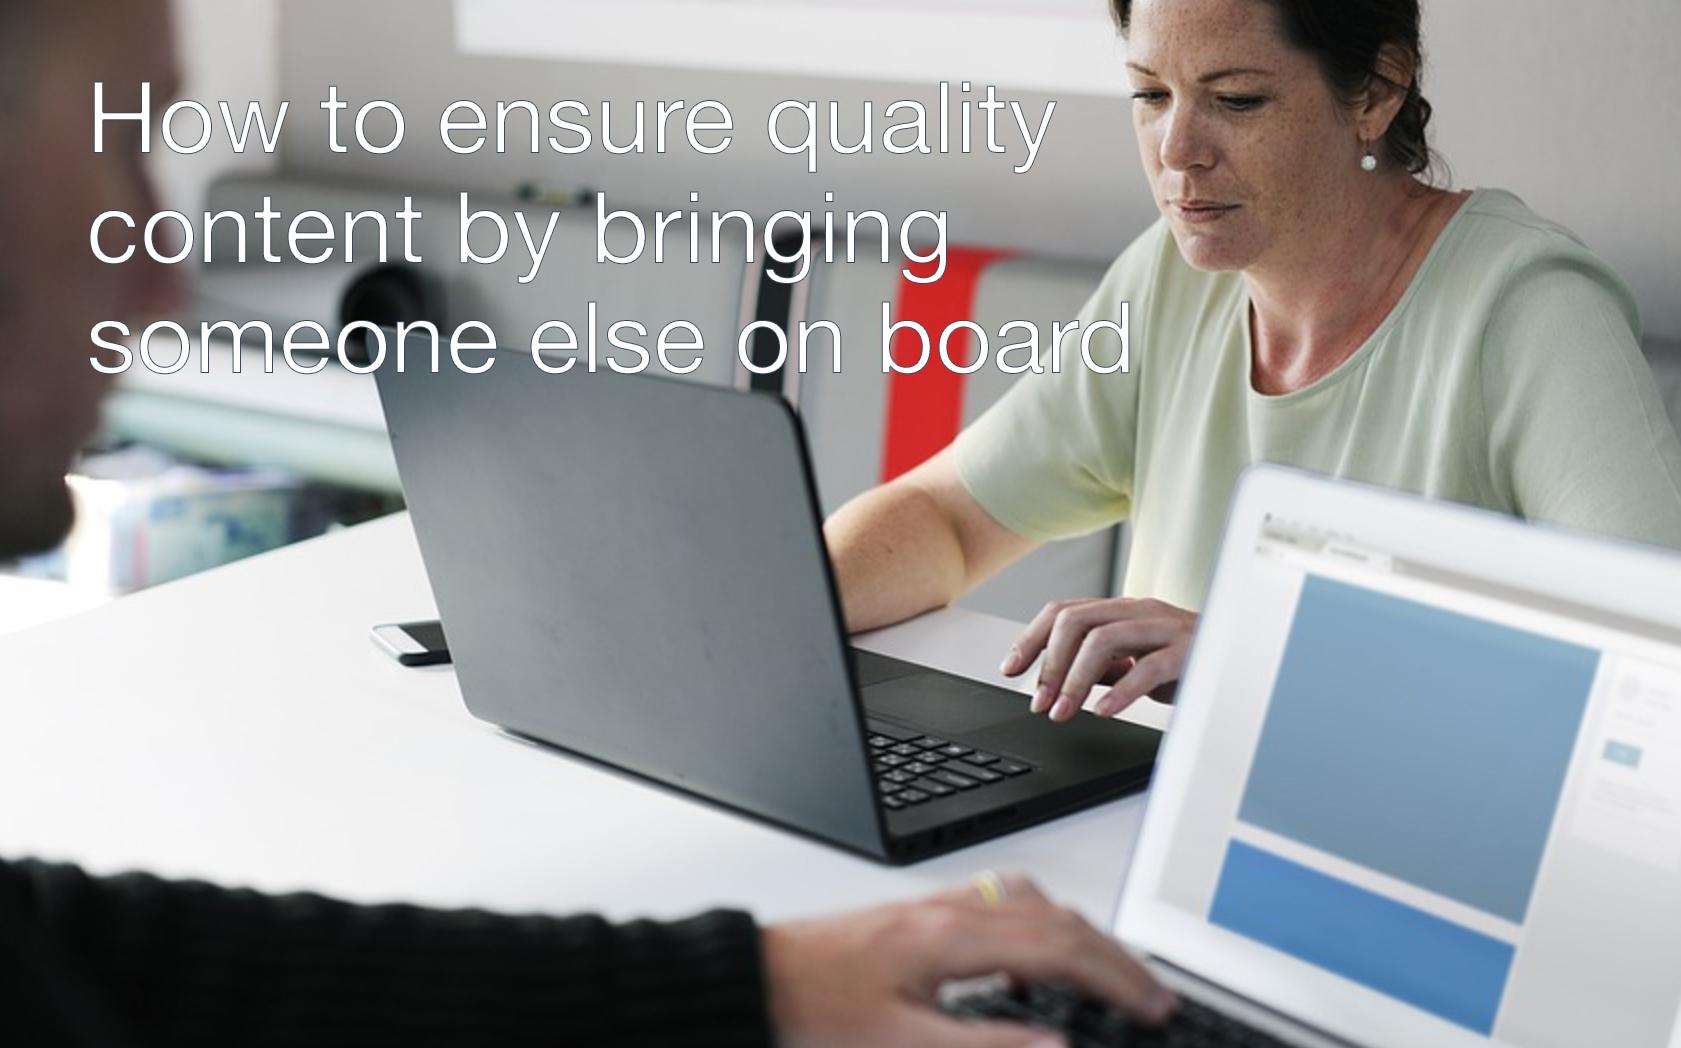 ensure quality content